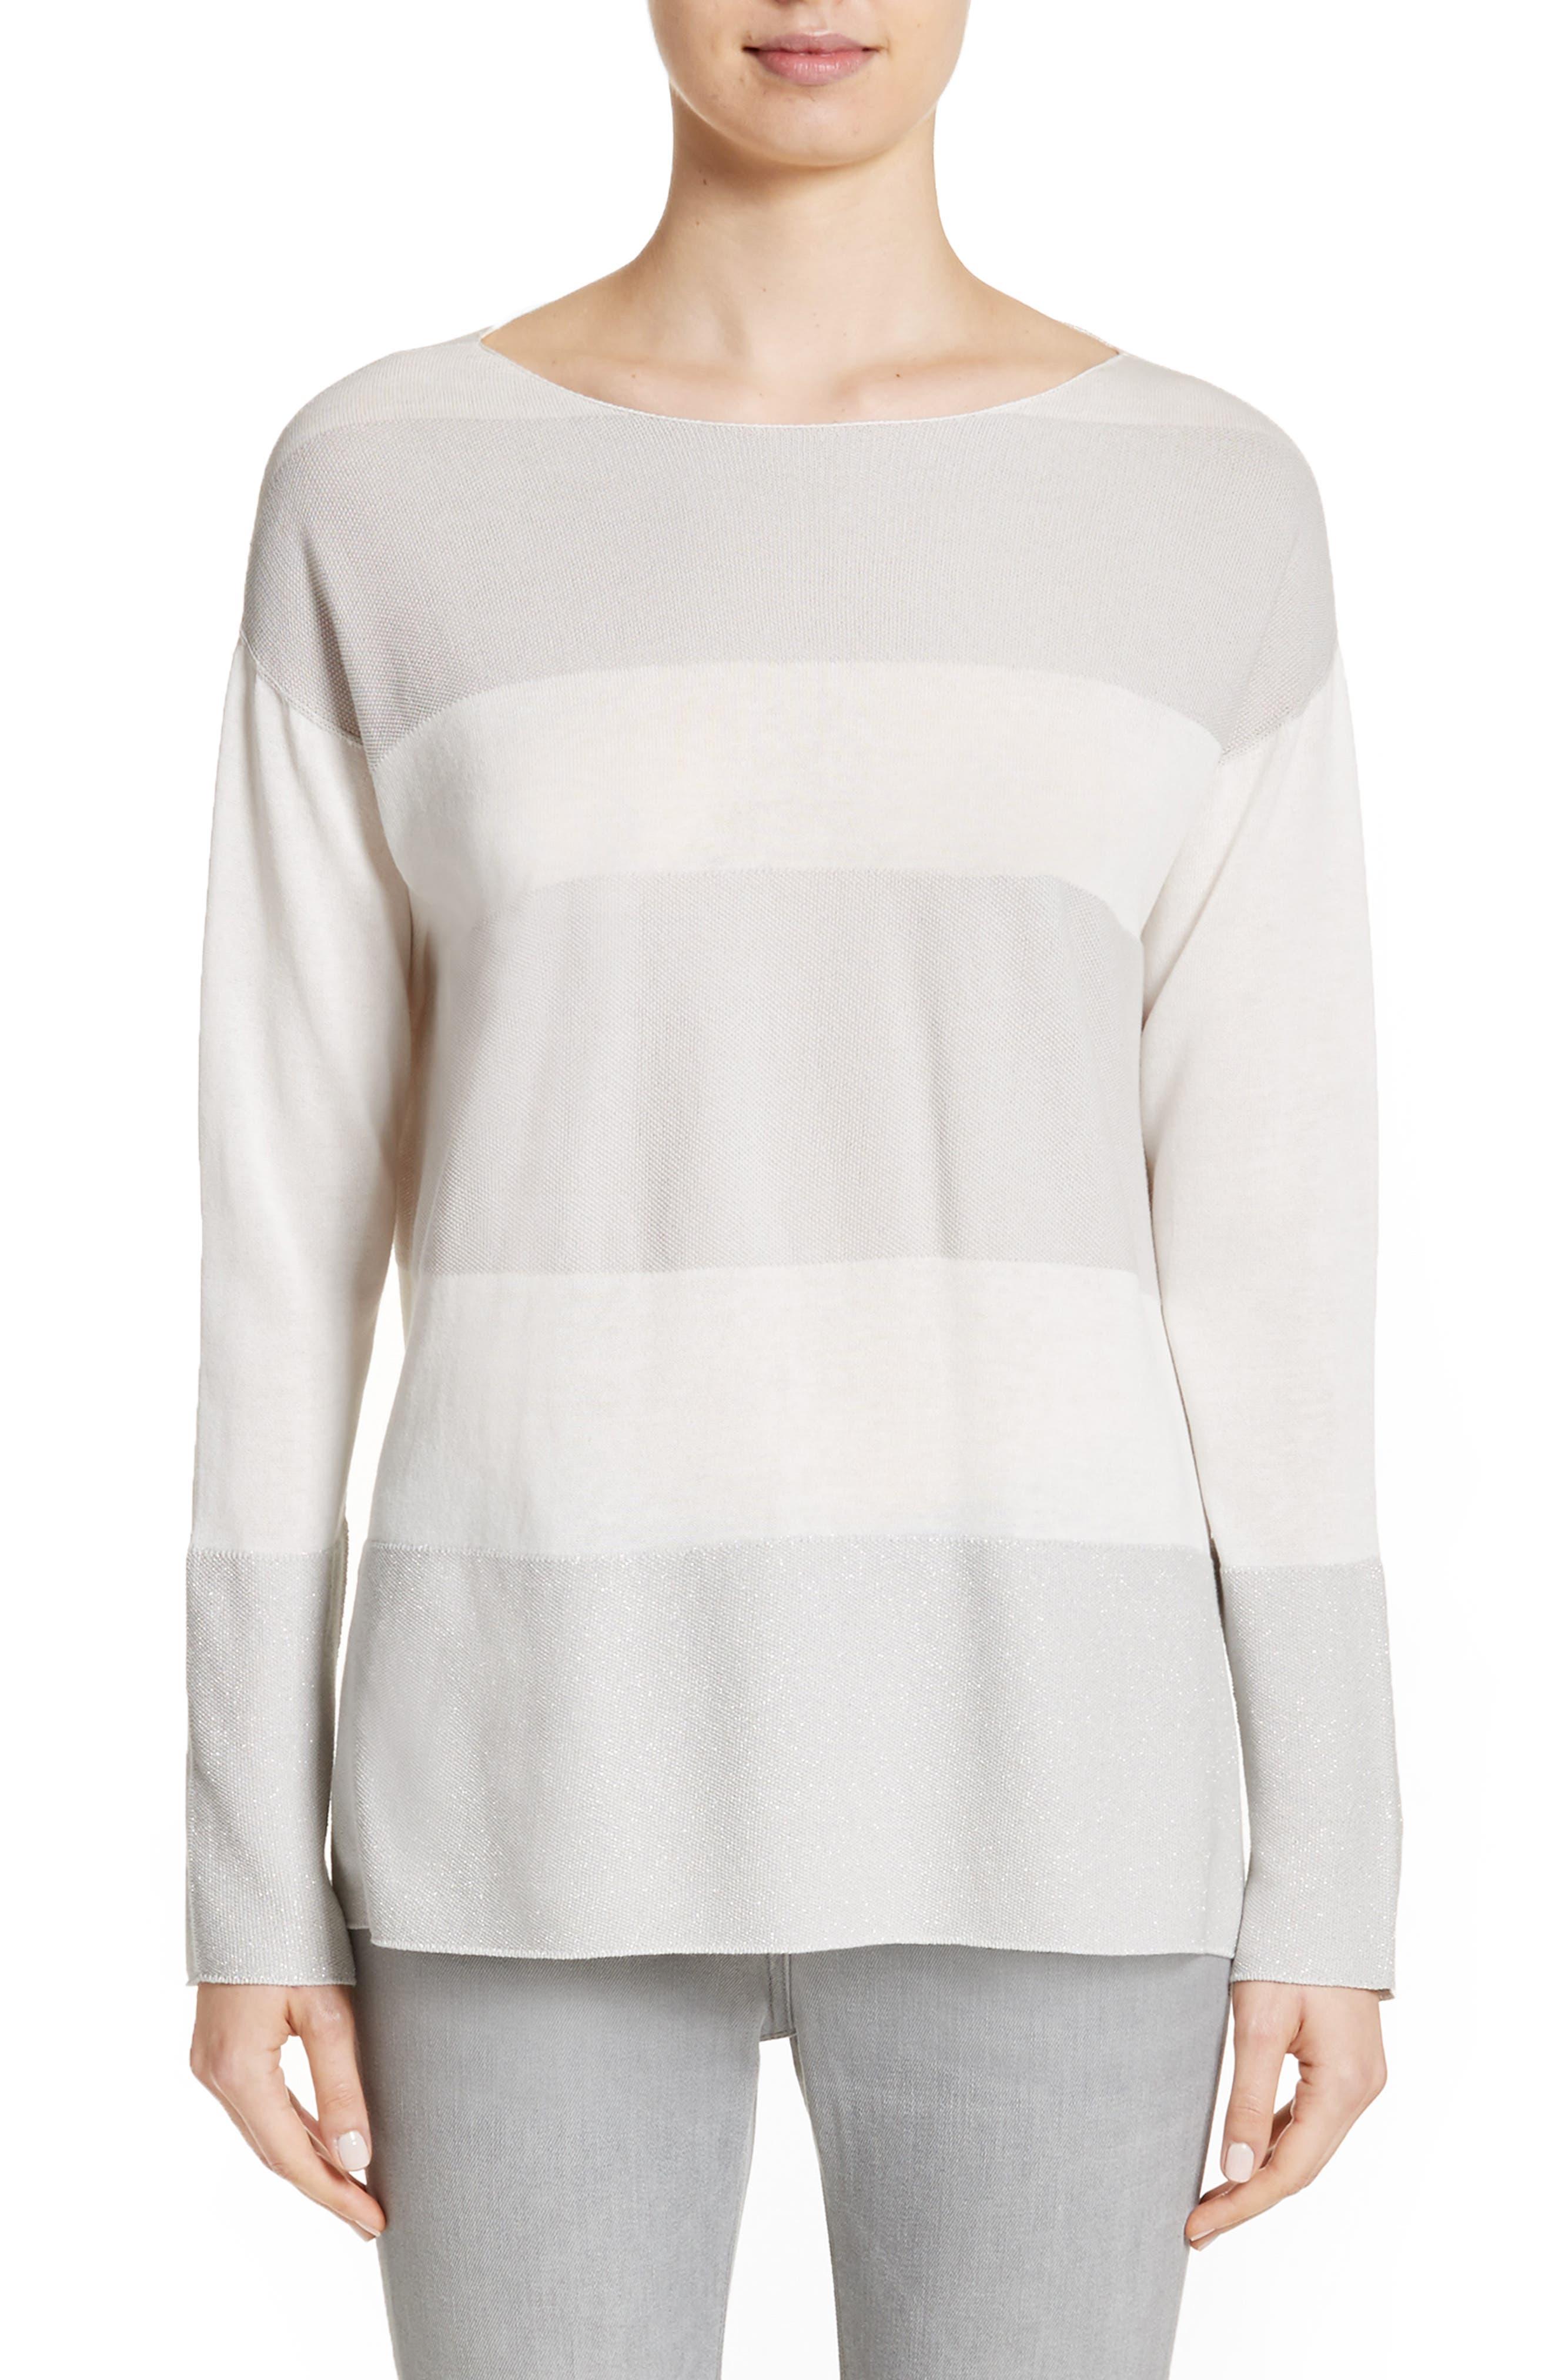 Alternate Image 1 Selected - Fabiana Filippi Popcorn Stripe Metallic Knit Sweater